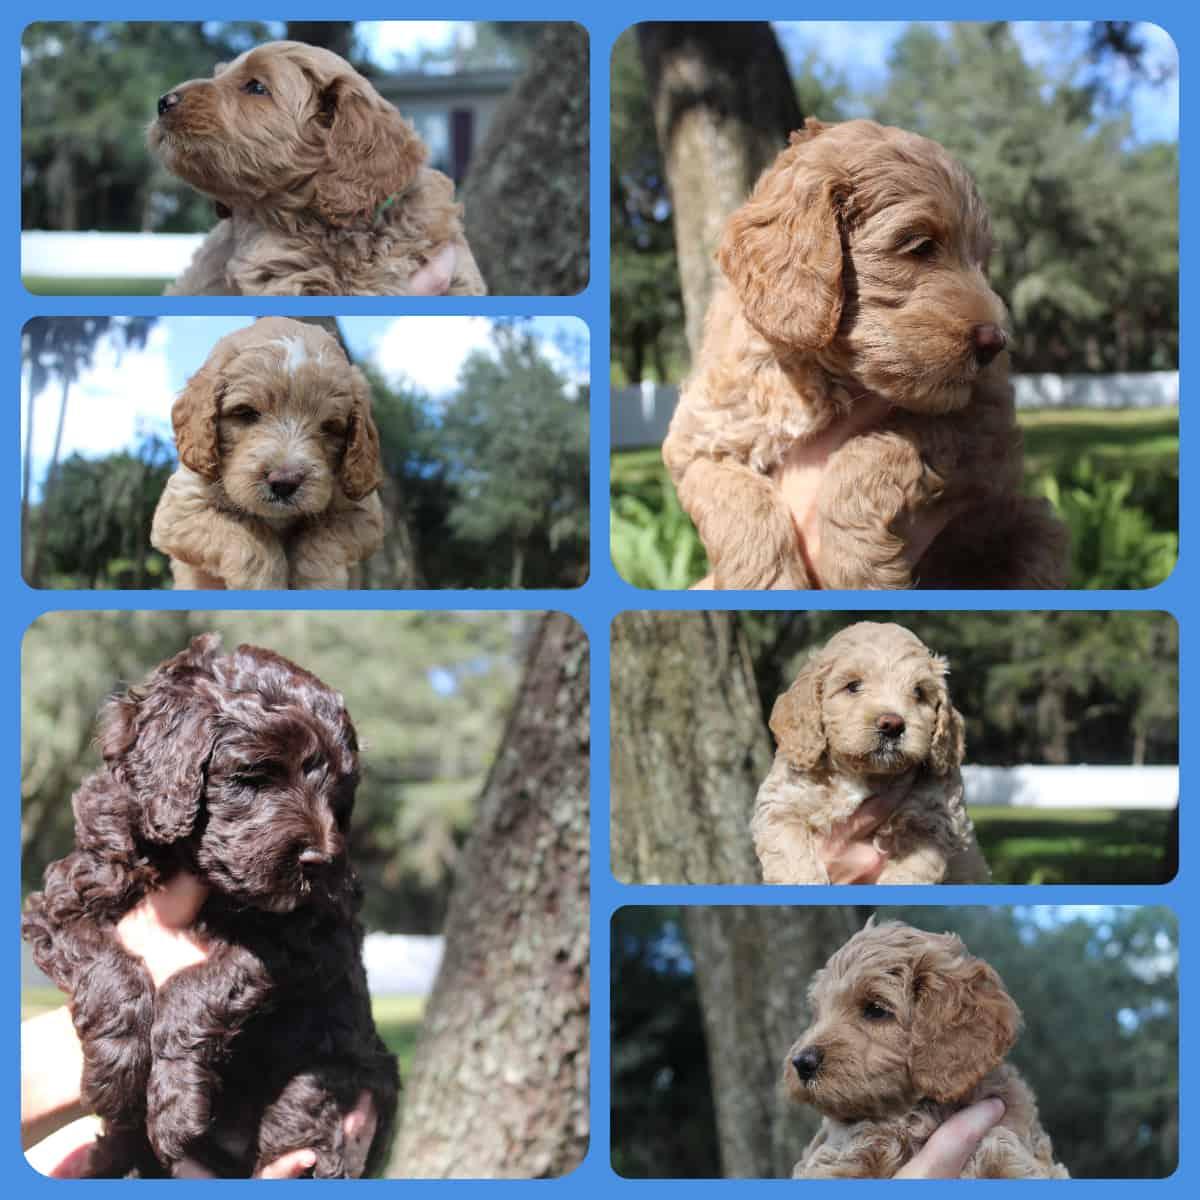 Kesi's Australian Labradoodle puppies - Fall 2020